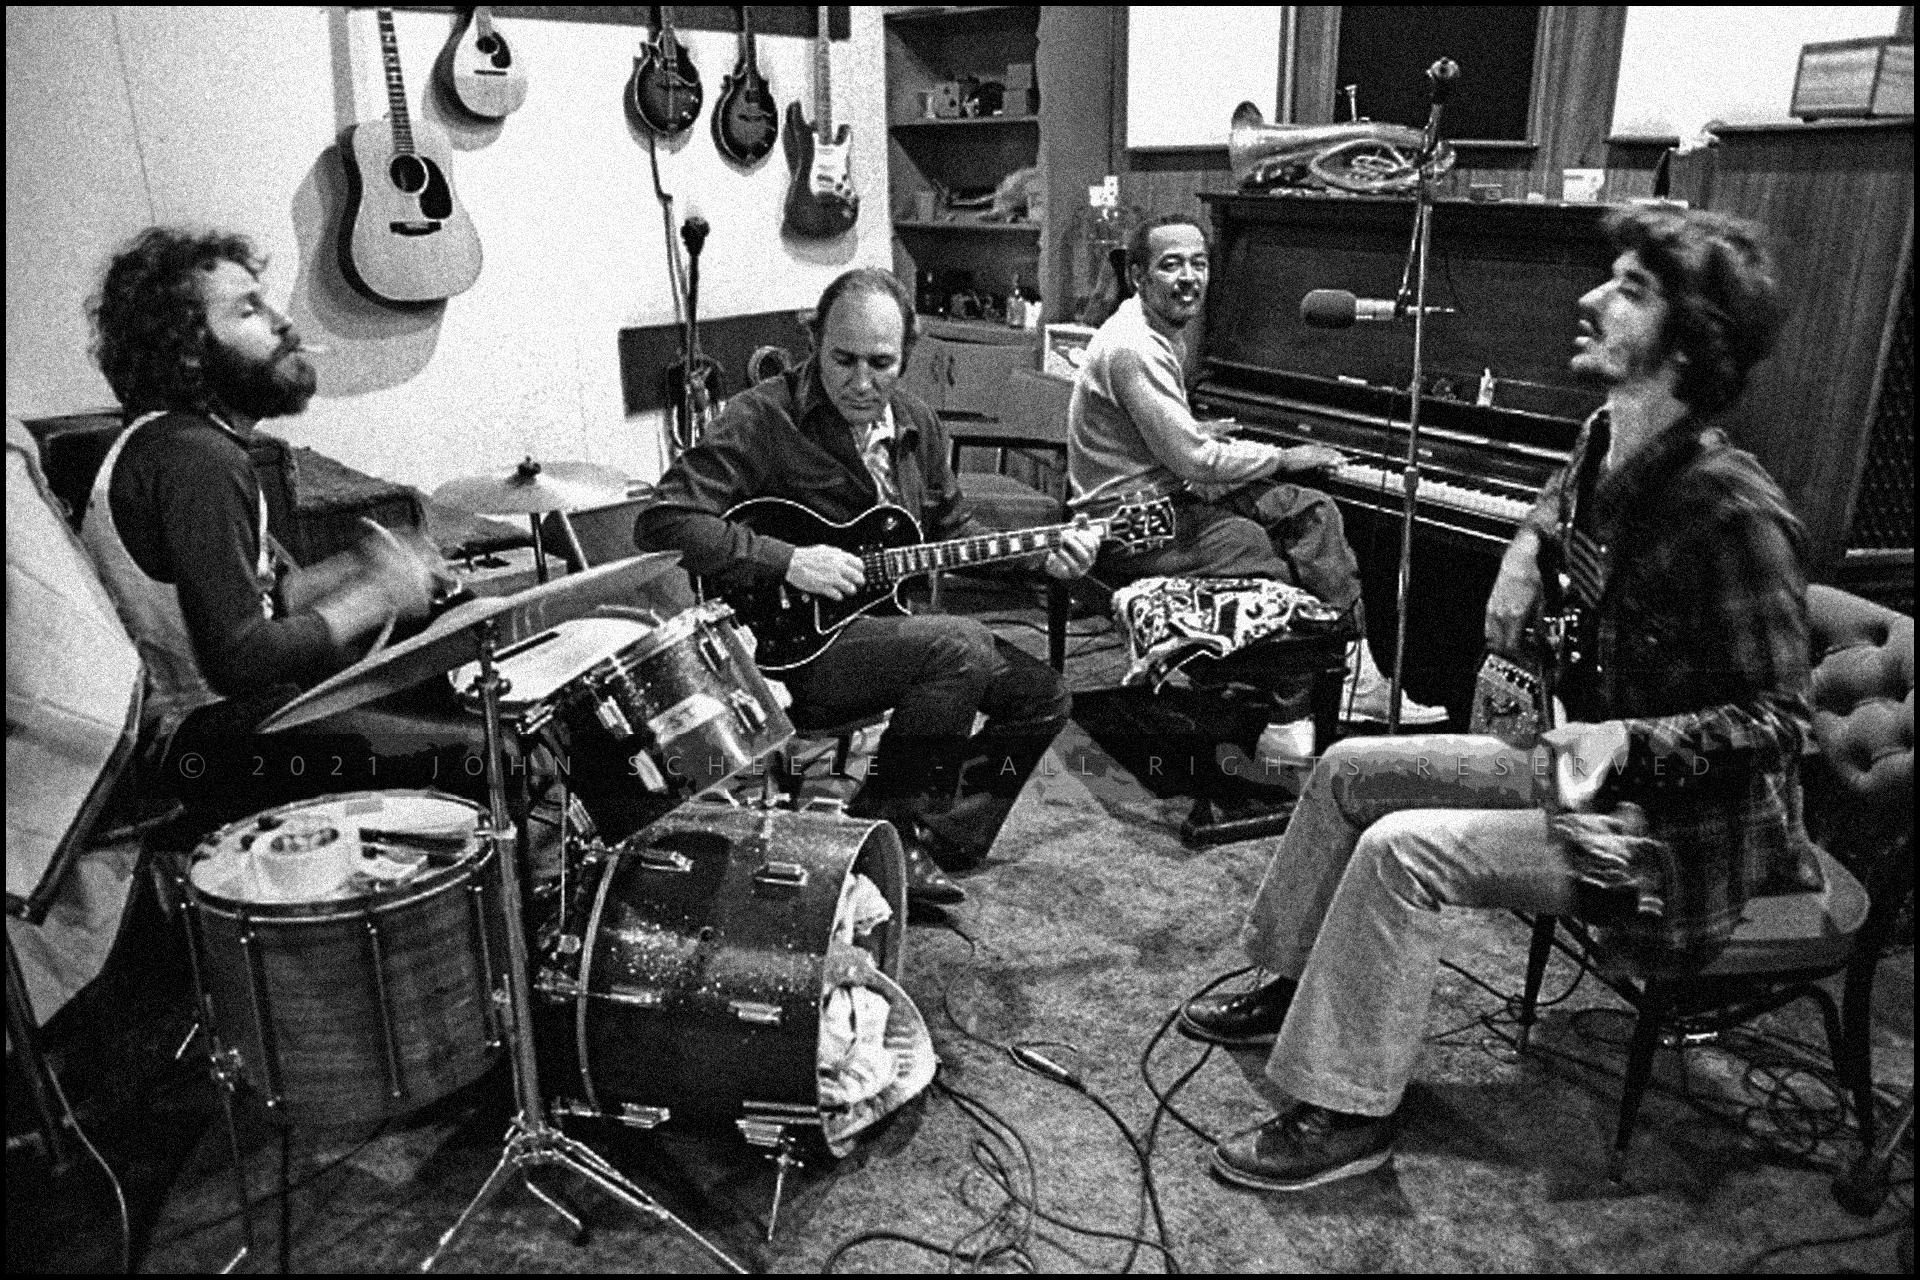 LEVON HELM, FRED CARTER, JR., HENRY GLOVER, RICK DANKO The Band - Shangri-La Studios, Malibu, CA (1975) © John Scheele